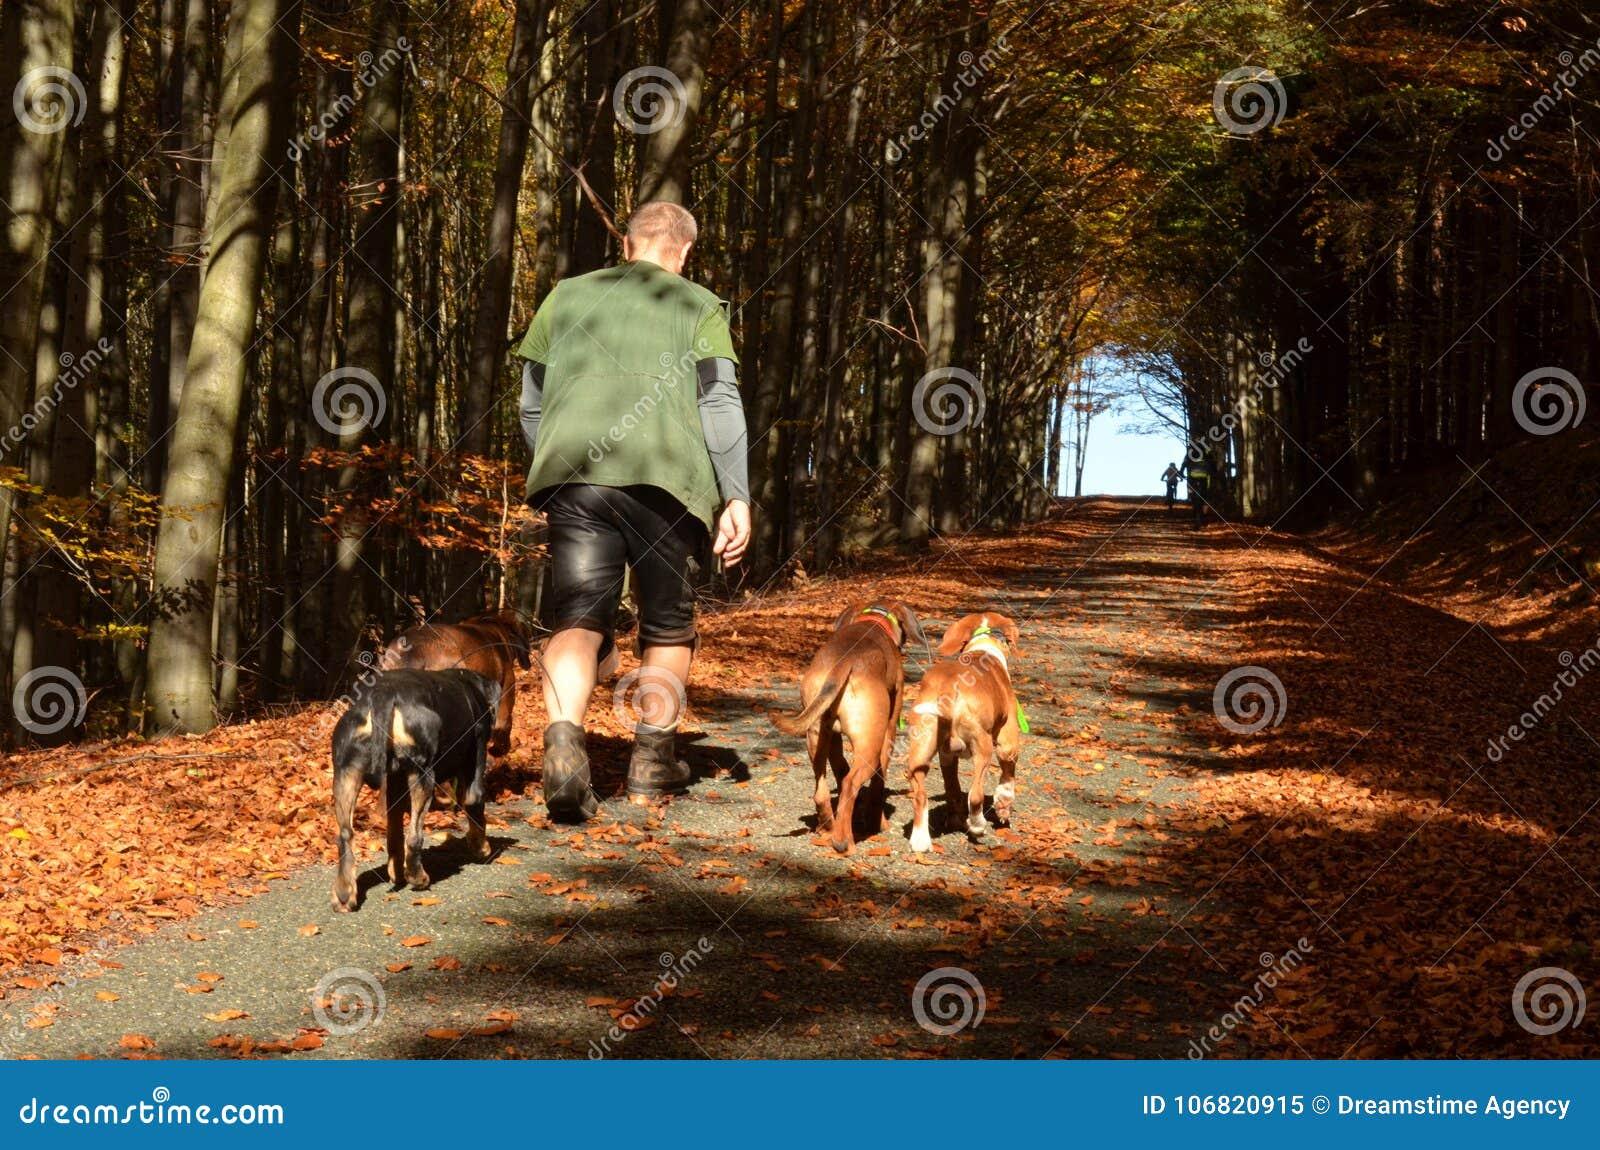 Walking the dogs, forest path in Czech Republic